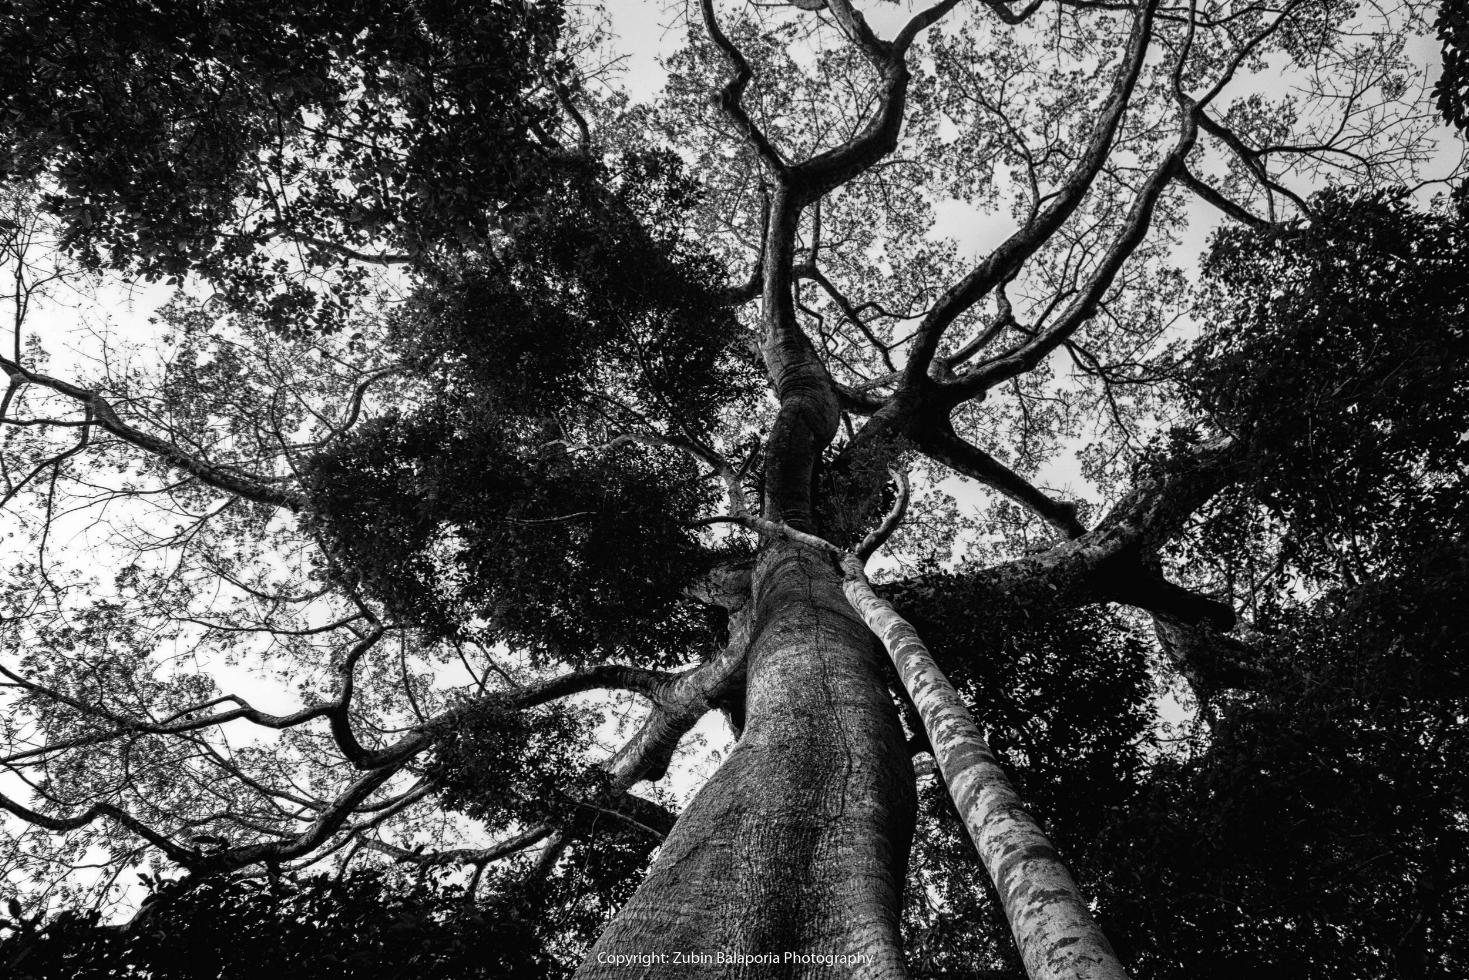 The Amazon Beanstalk